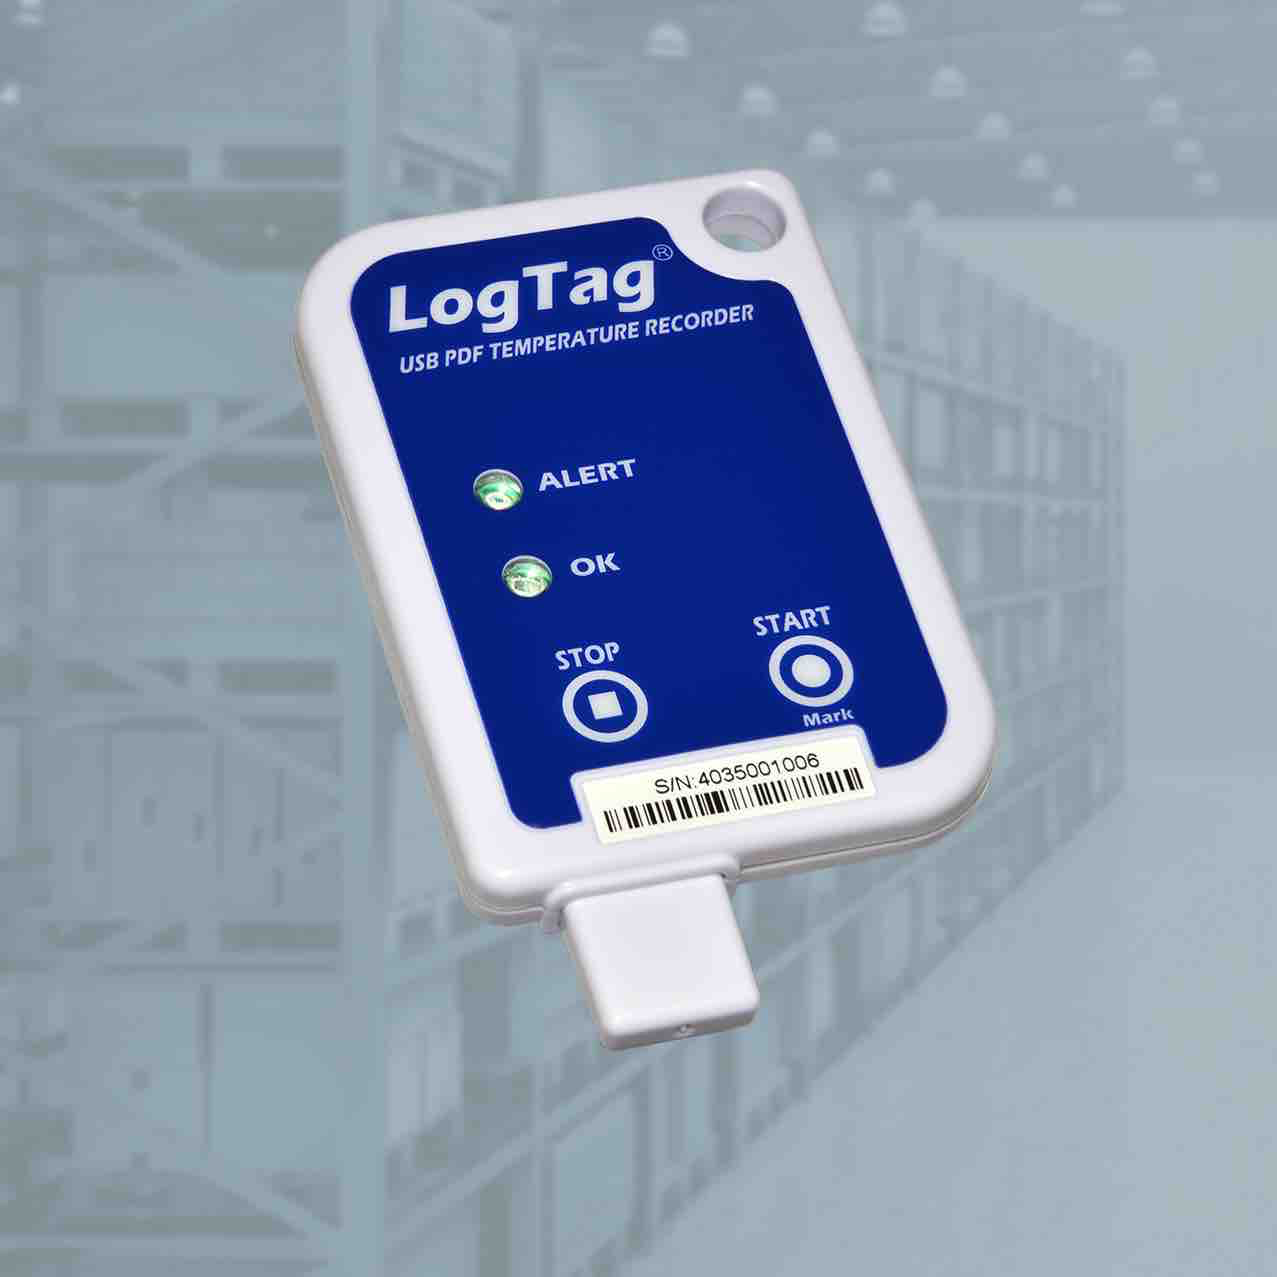 Термоиндикатор ЛогТэг ЮТРИКС-16 (LogTag USRIC-4) однократного запуска, с поверкой